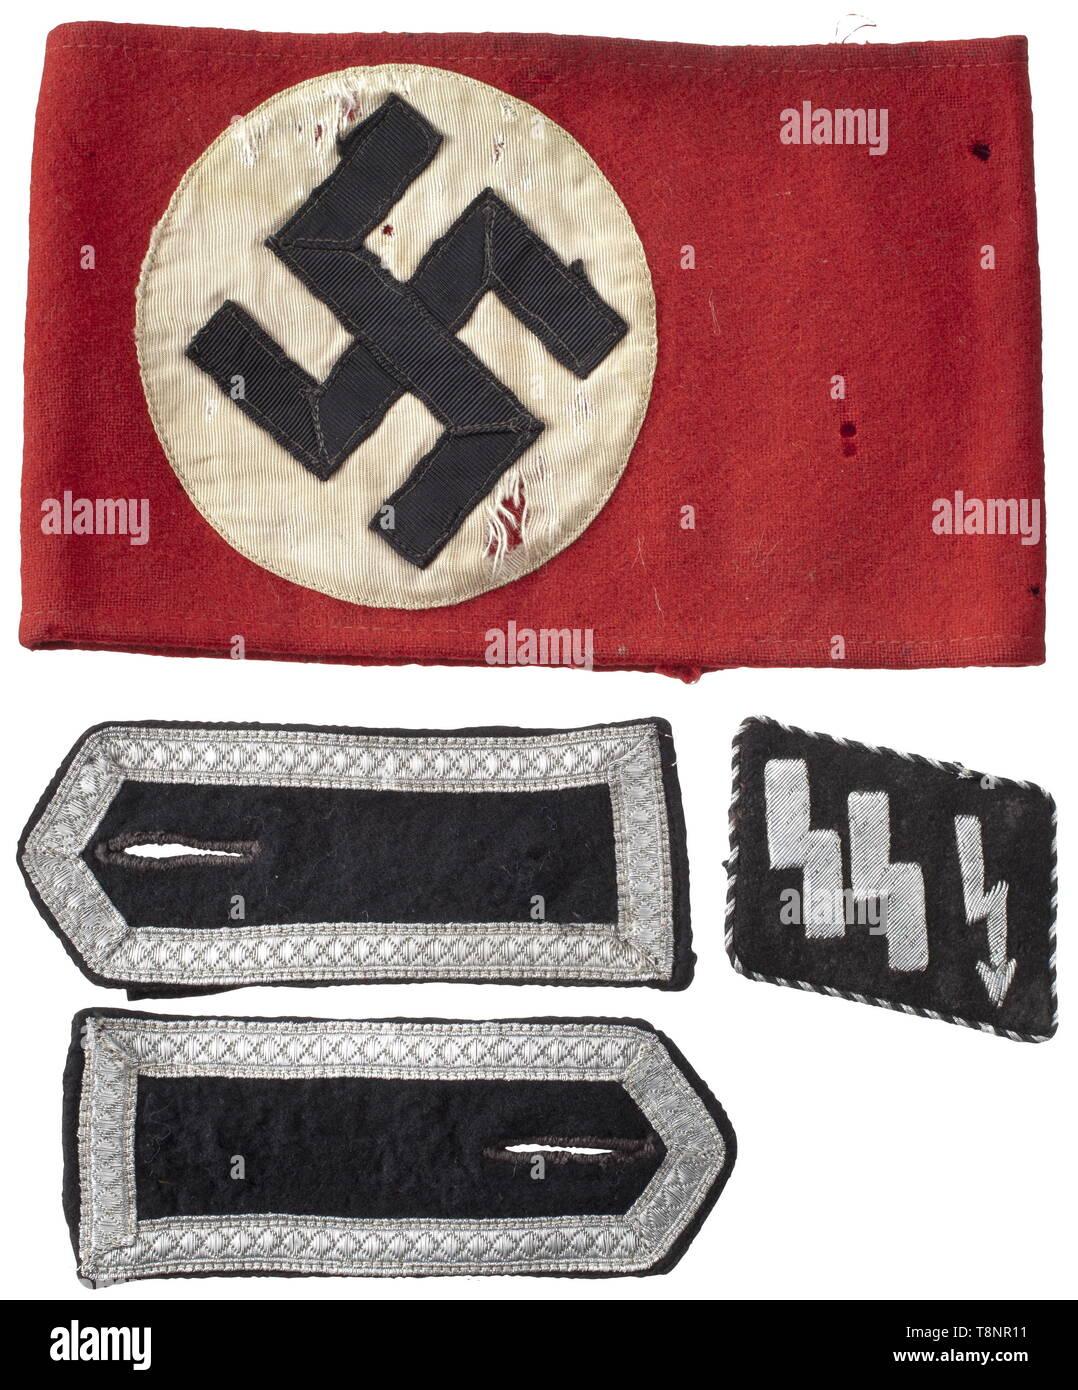 Insignia of a member of the SS-Nachrichtensturm of the